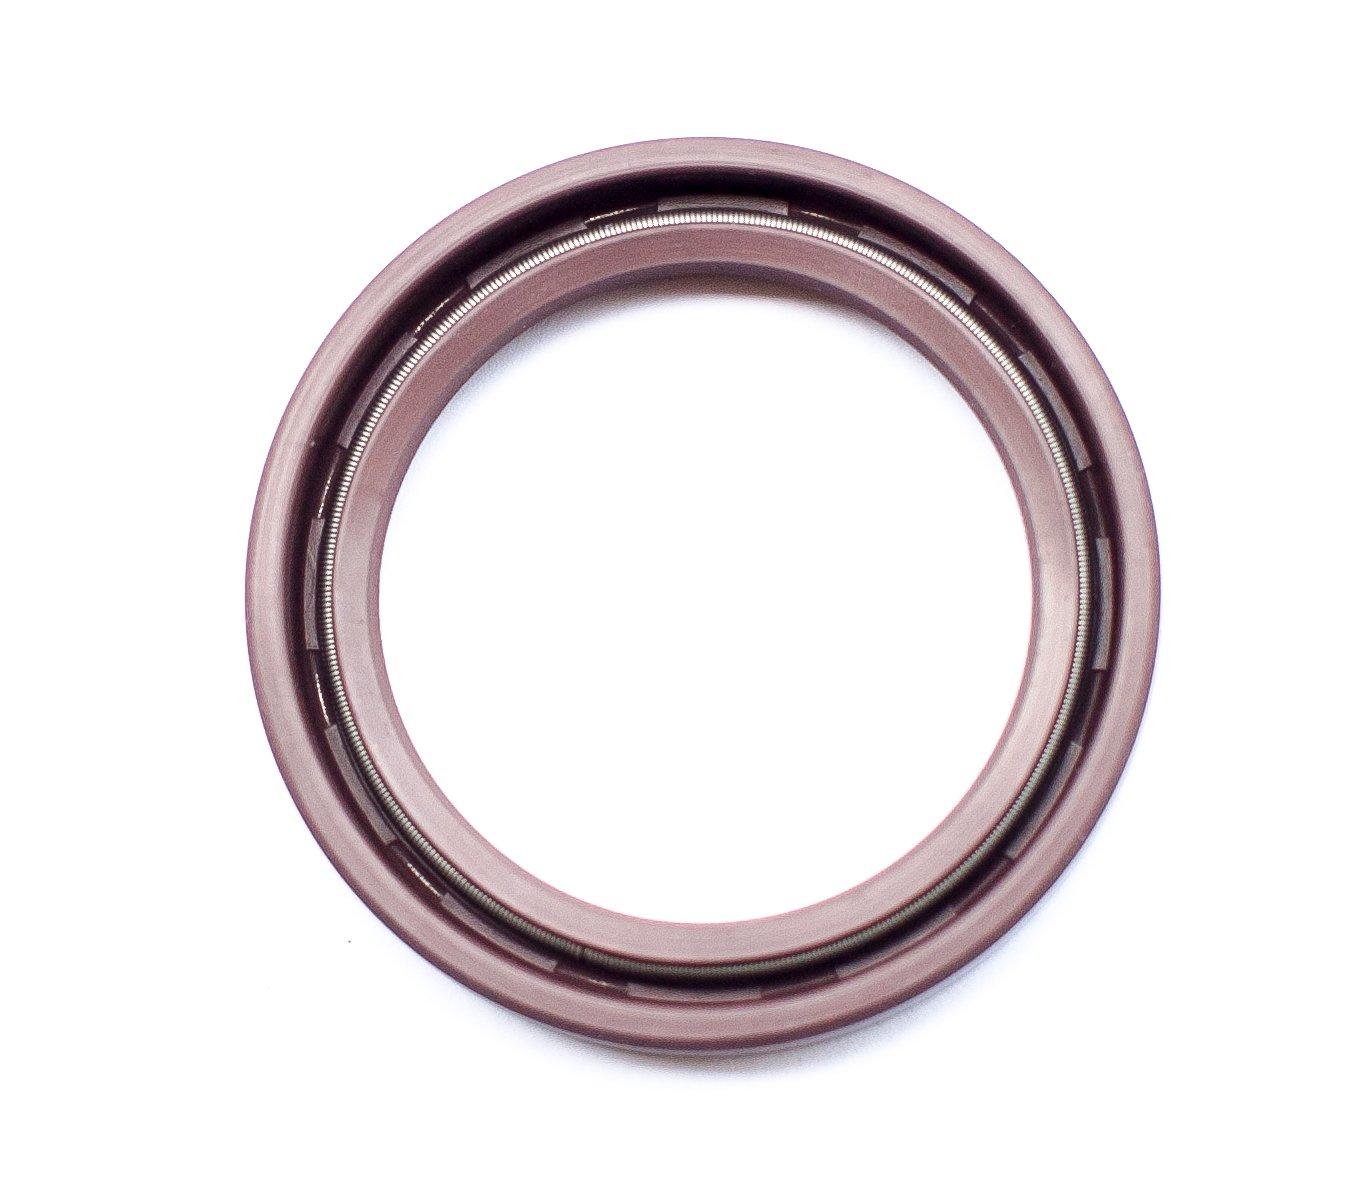 Oil Seal 35X47X7 (10 PCS) Viton Oil Seal Grease Seal TC |EAI Rubber Double Lip w/Garter Spring 35mmX47mmX7mm | 1.378''x1.850''x0.276'' by EAI (Image #2)